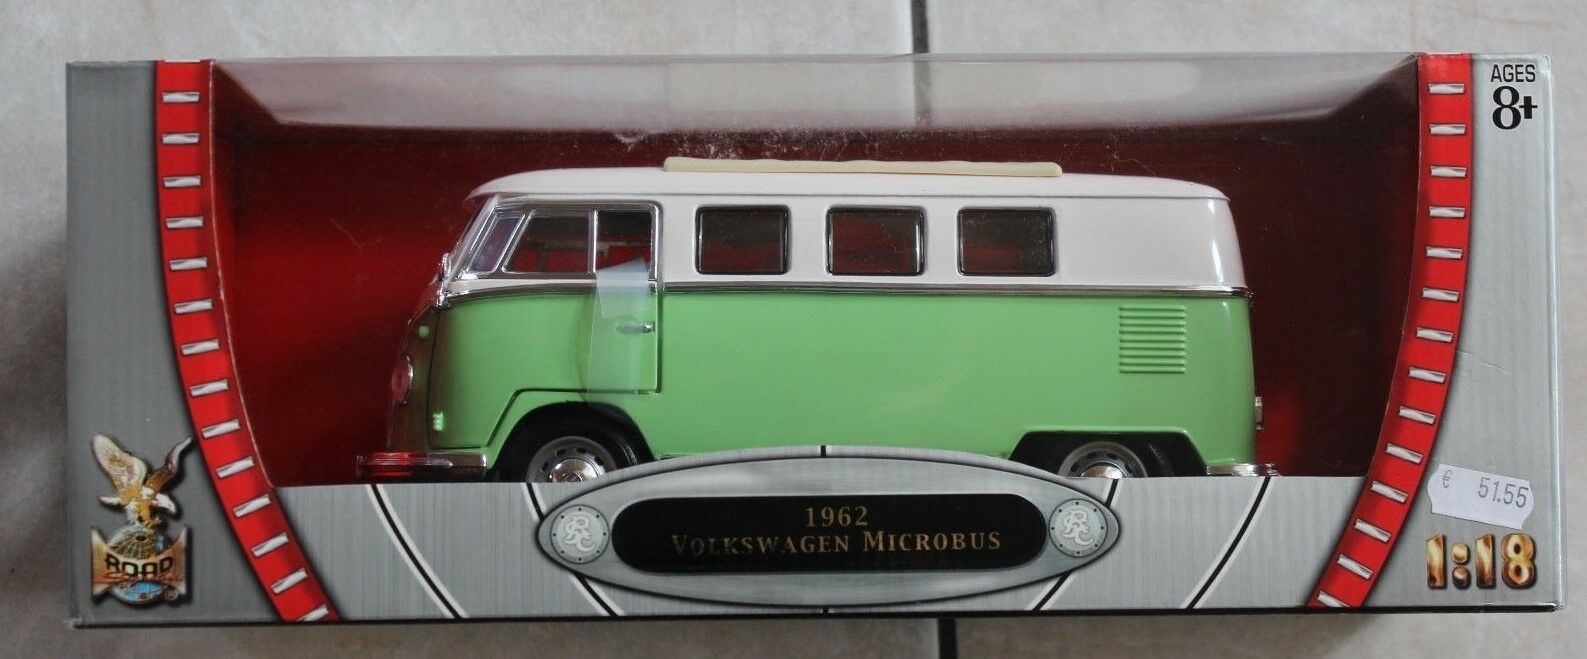 Yat Ming 92328 Volkswagen Microbus 1962 hellgrün 1 18